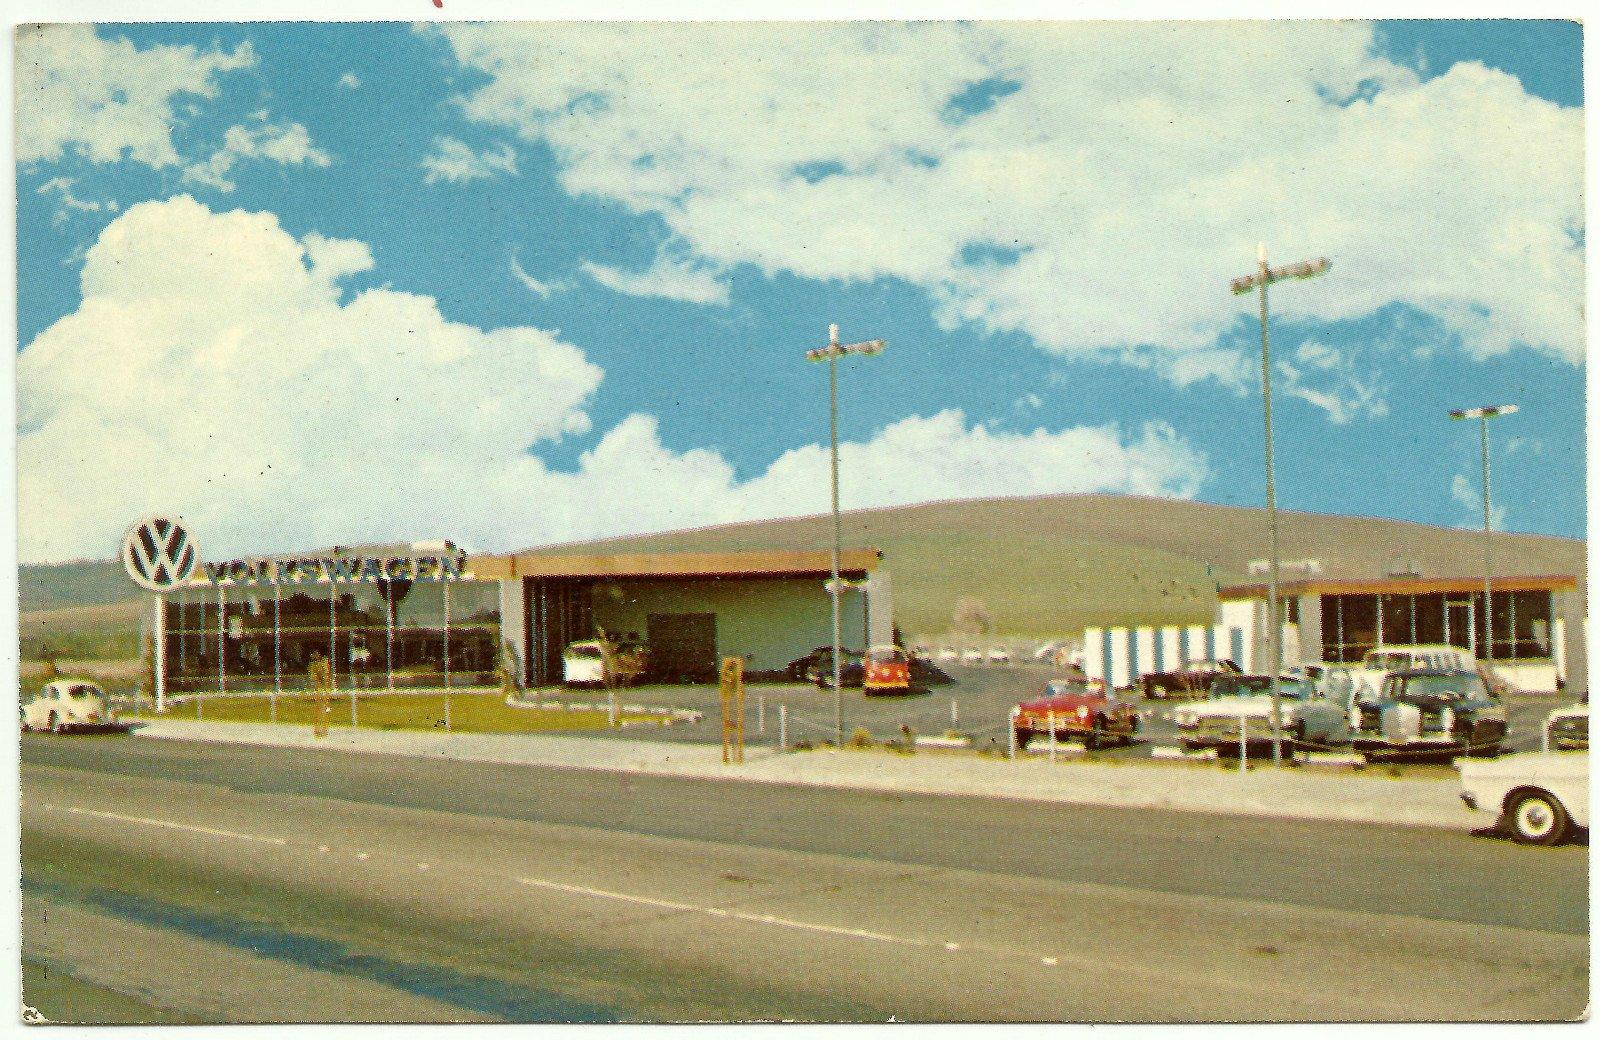 Thesamba Com Abbes Volkswagen Livermore California